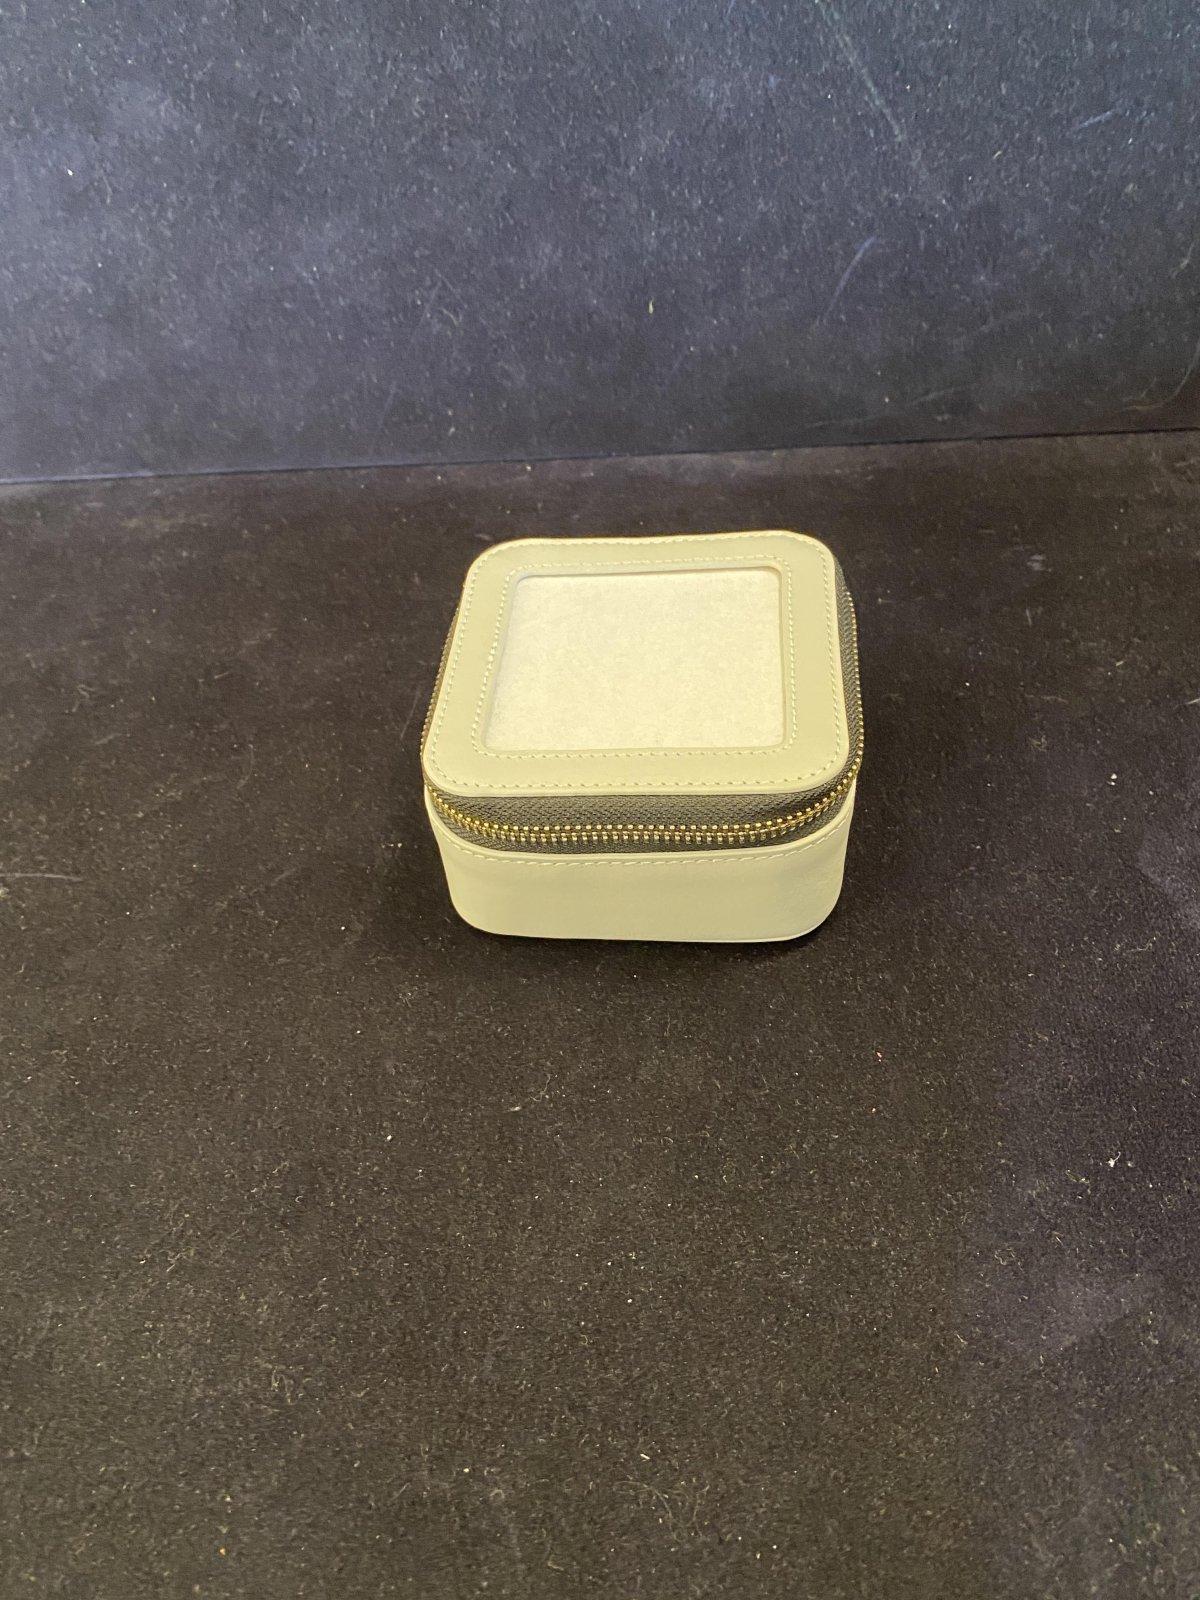 Leather Square Jewelry Box